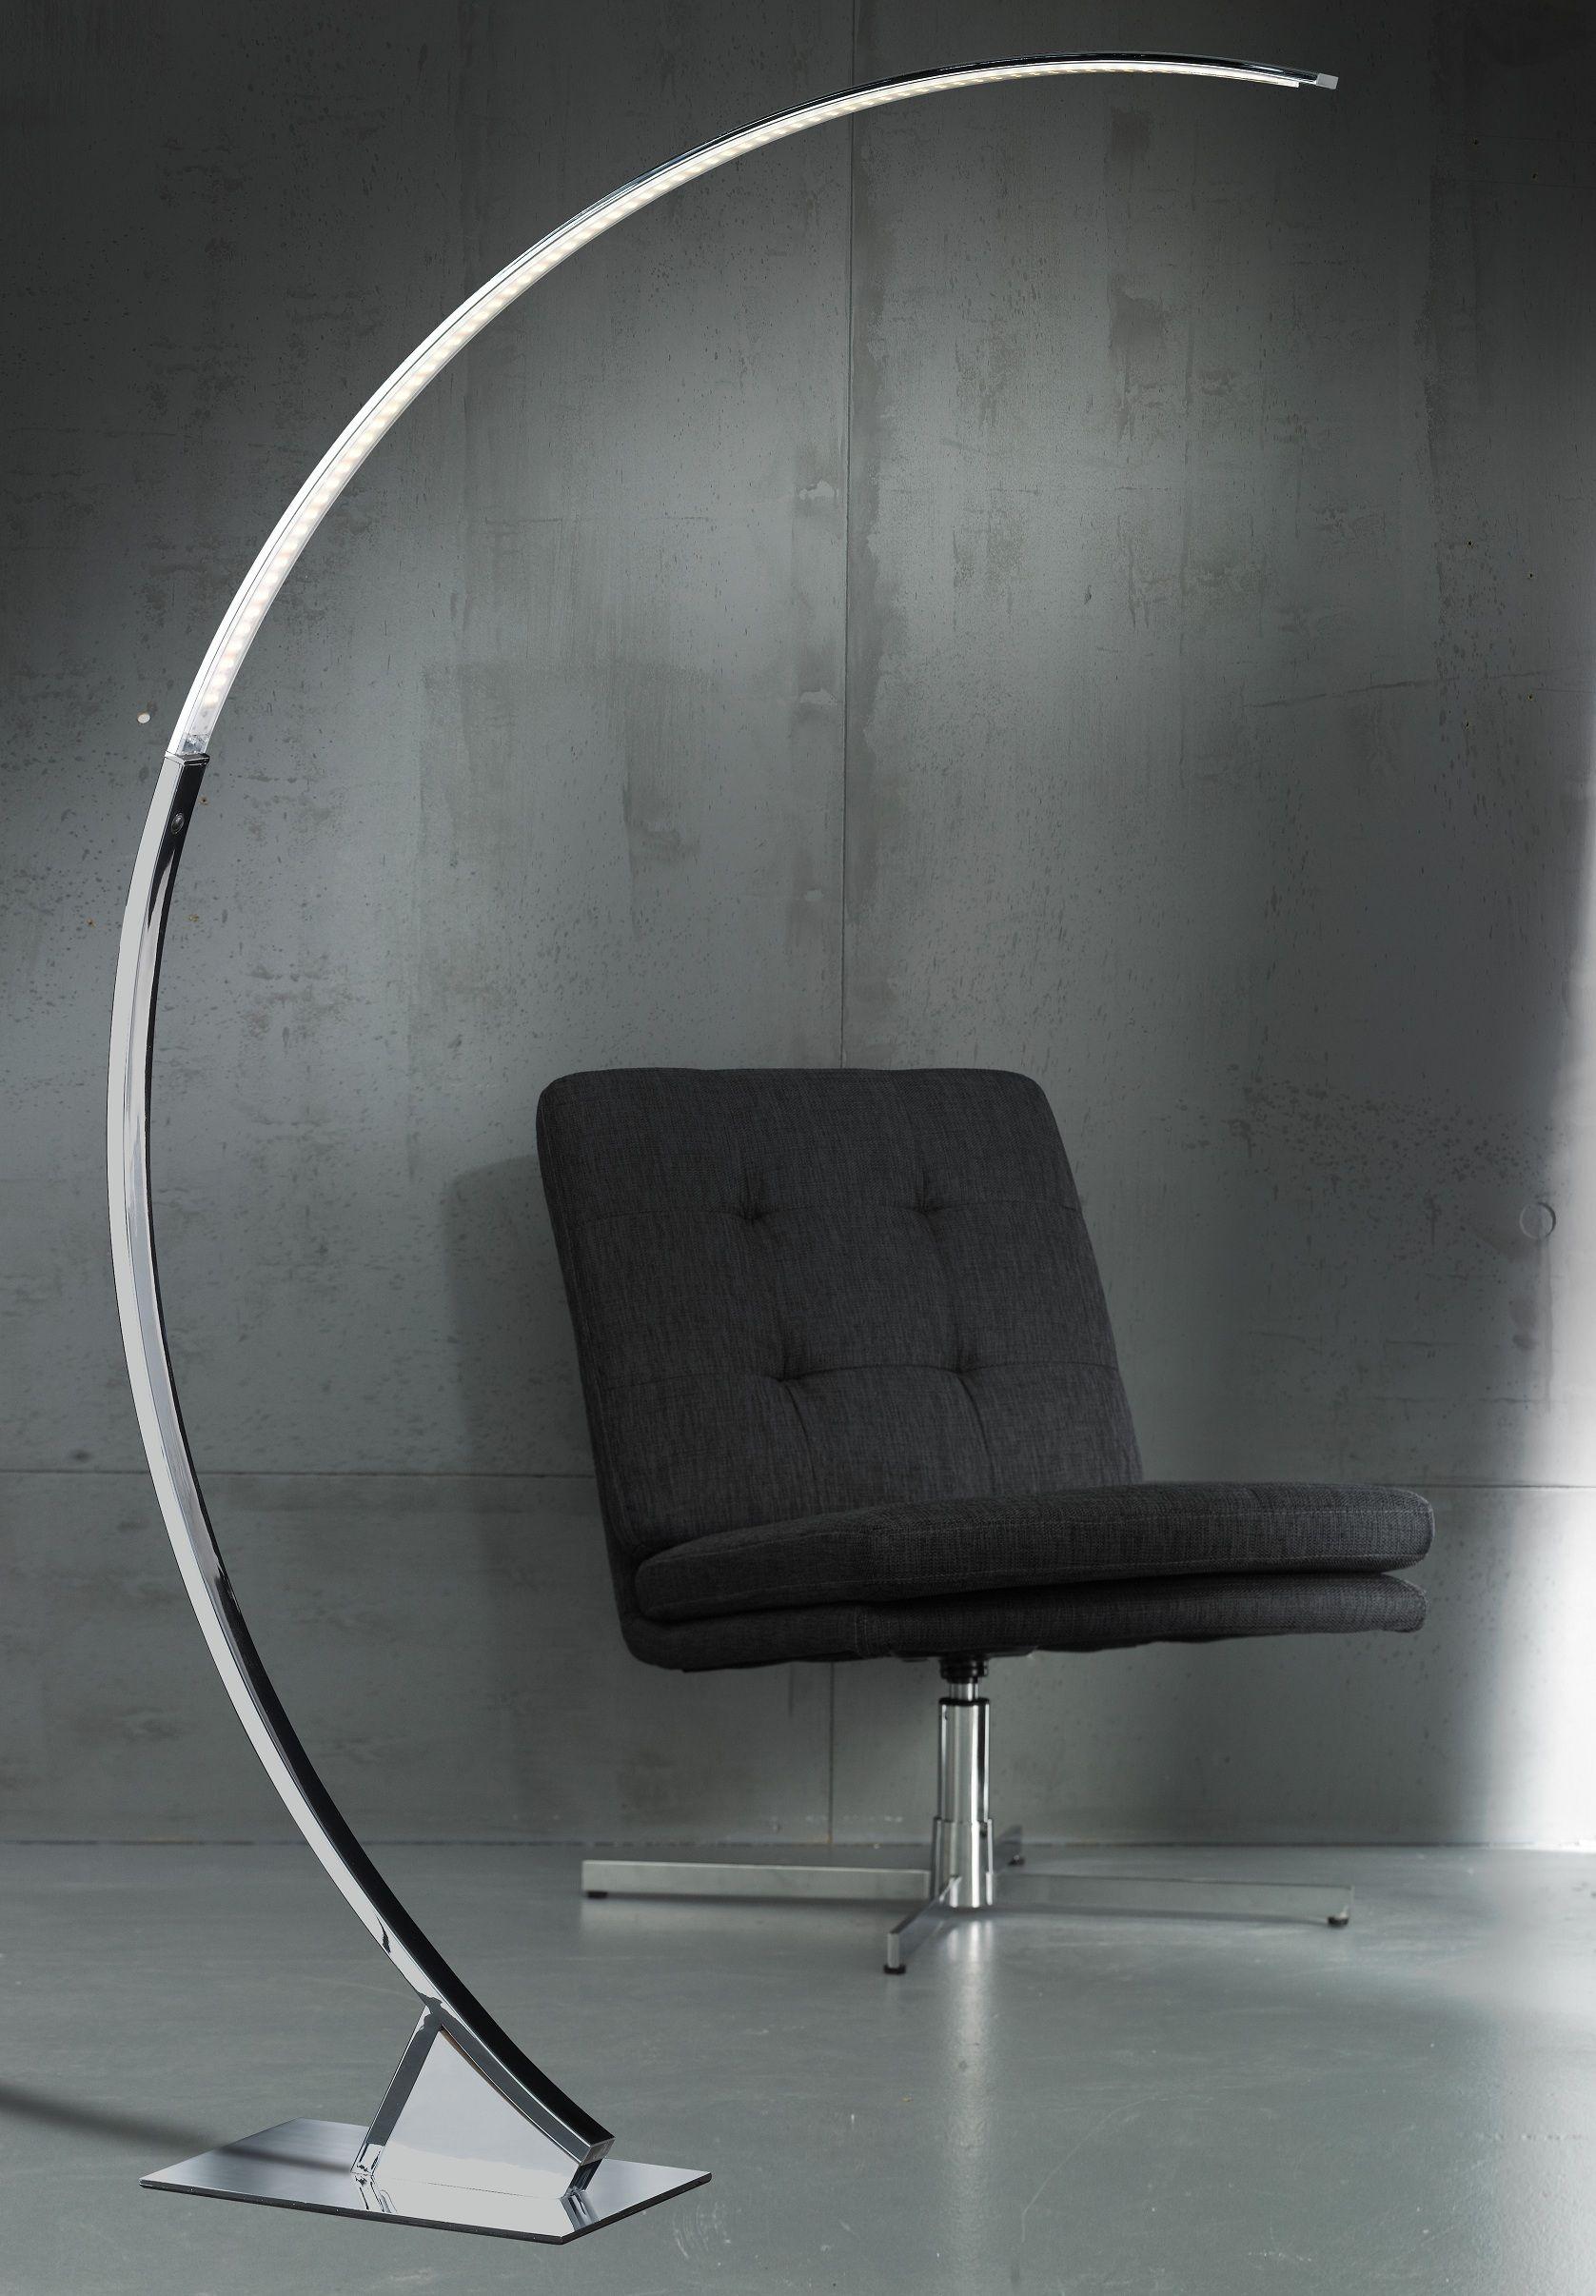 Wofi Arc Chrome Contemporary Floor Lamp Modern Floor Lamps Floor Lamp Design Contemporary Floor Lamps